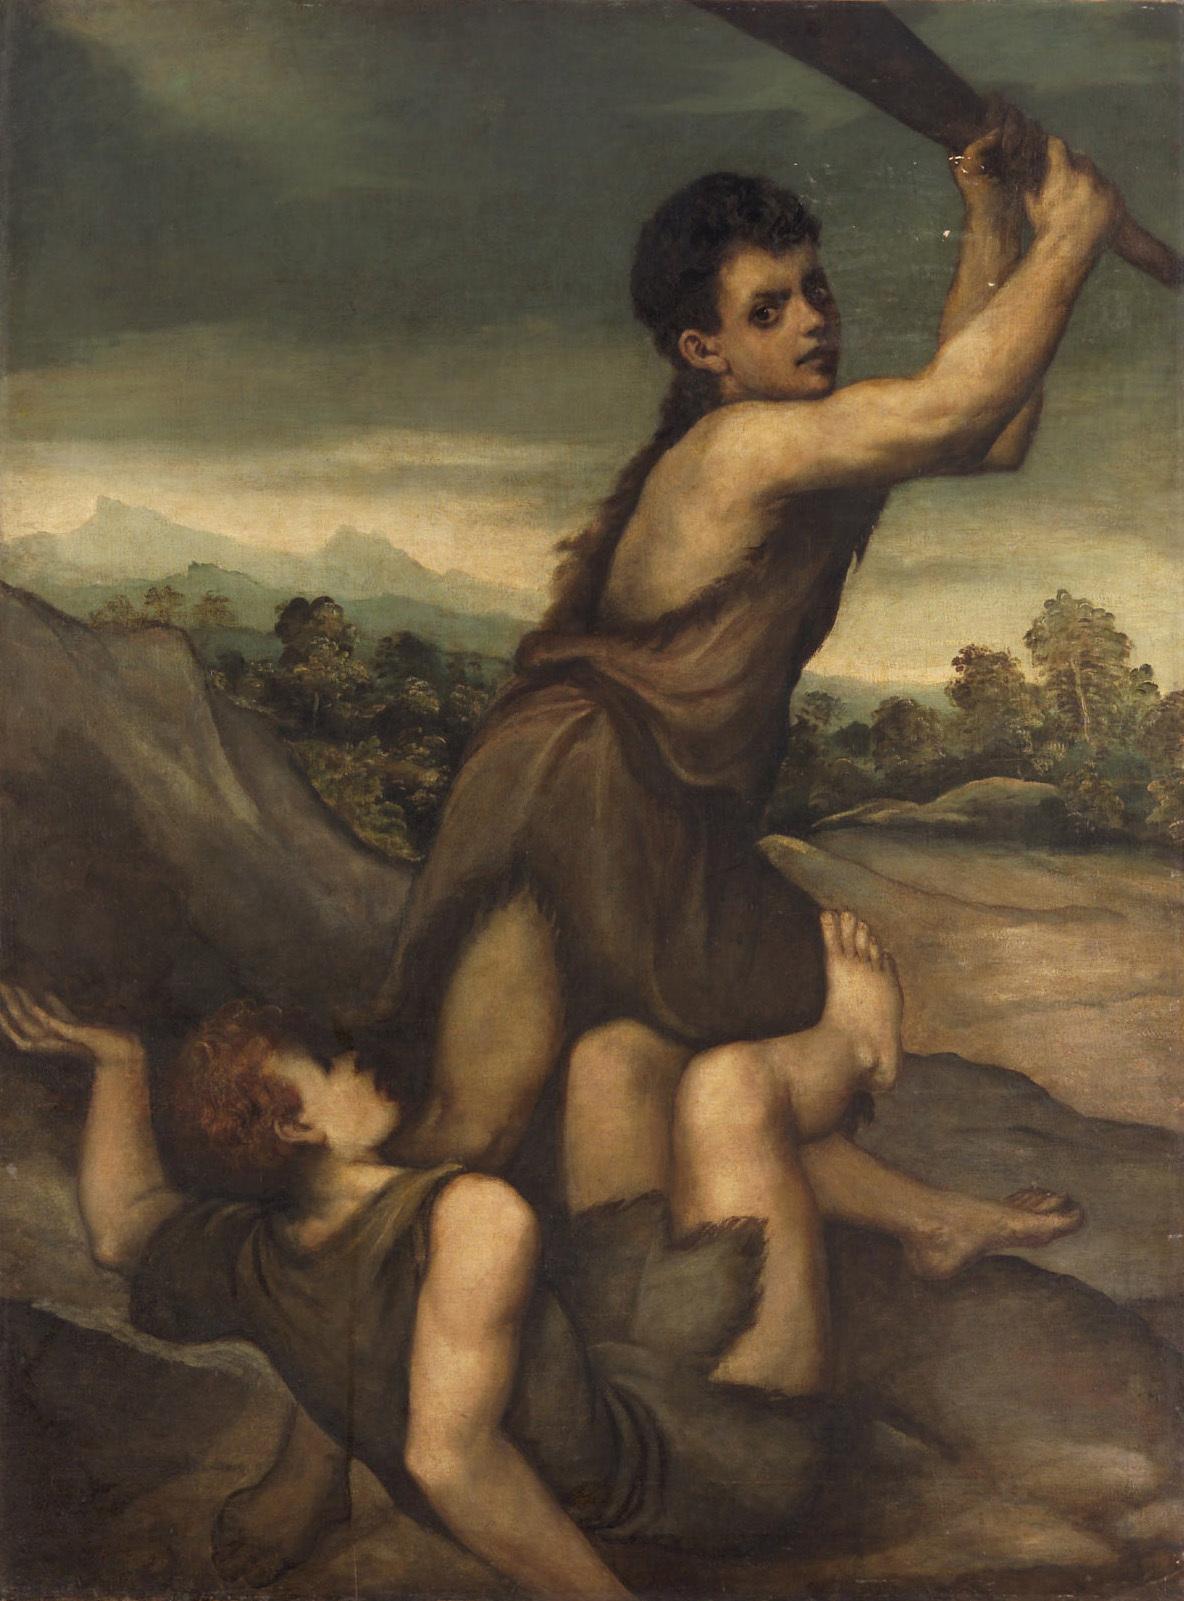 Каким предметом Каин убил Авеля?